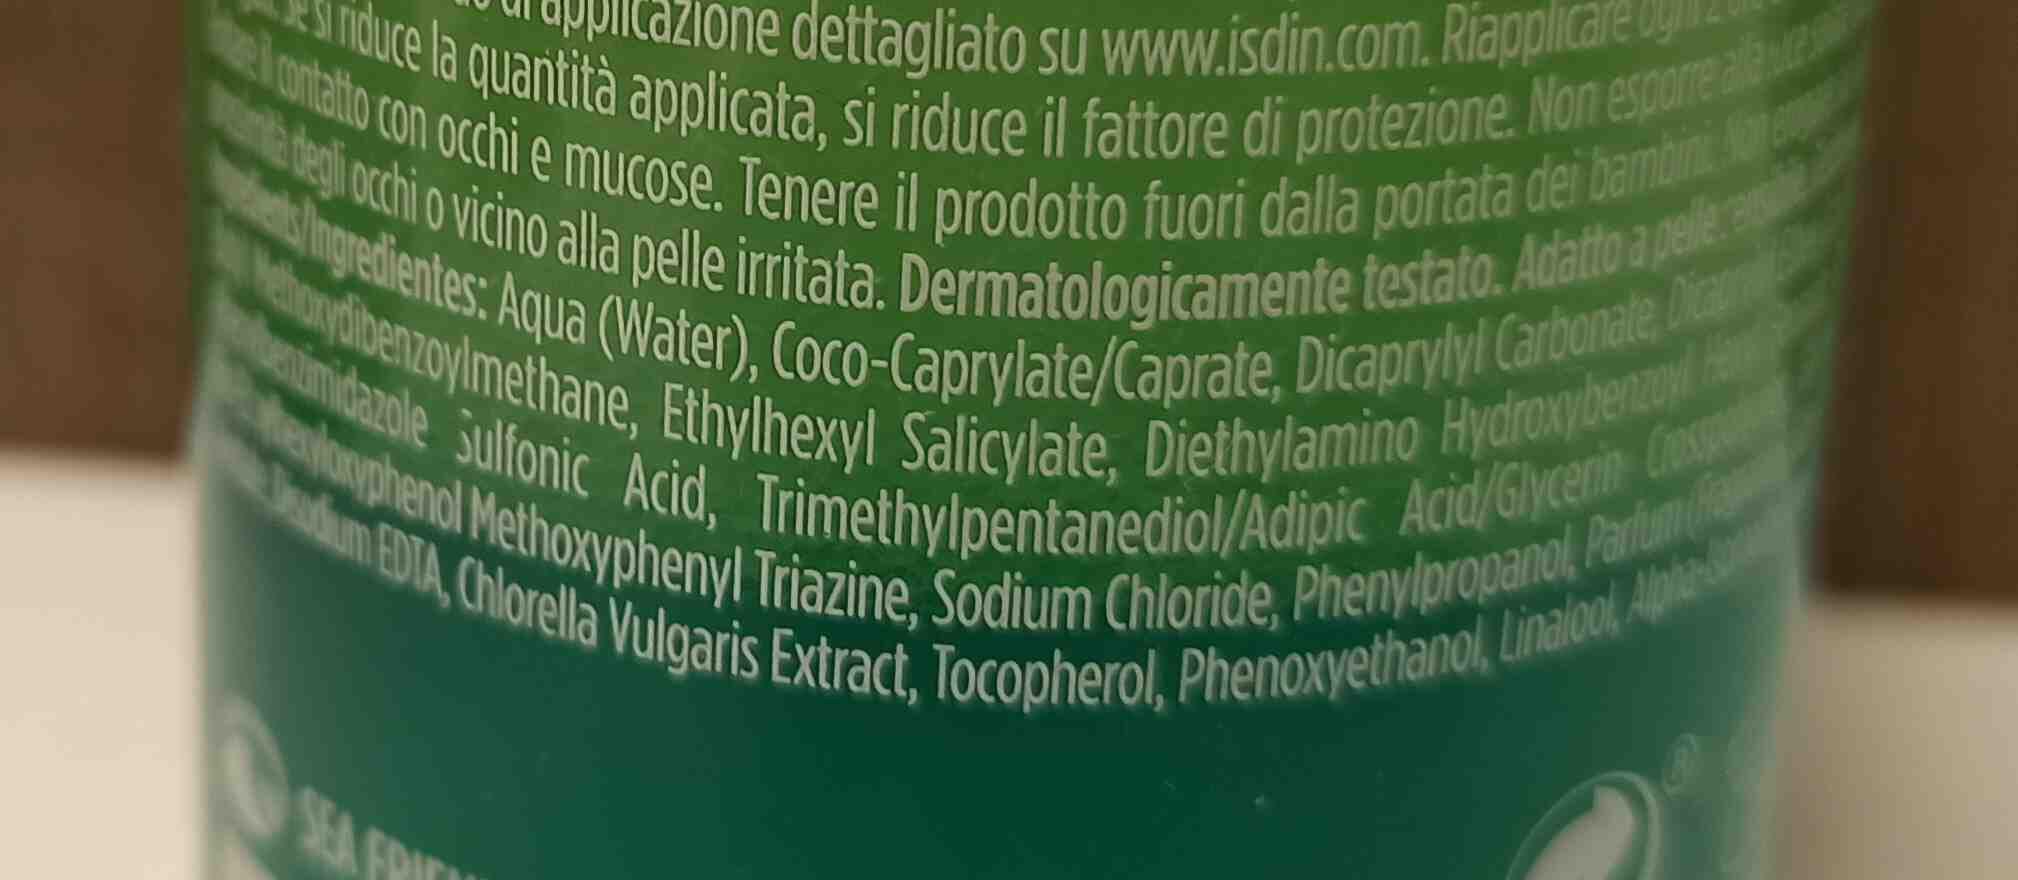 isdin hydro lotion - Ingredienti - en